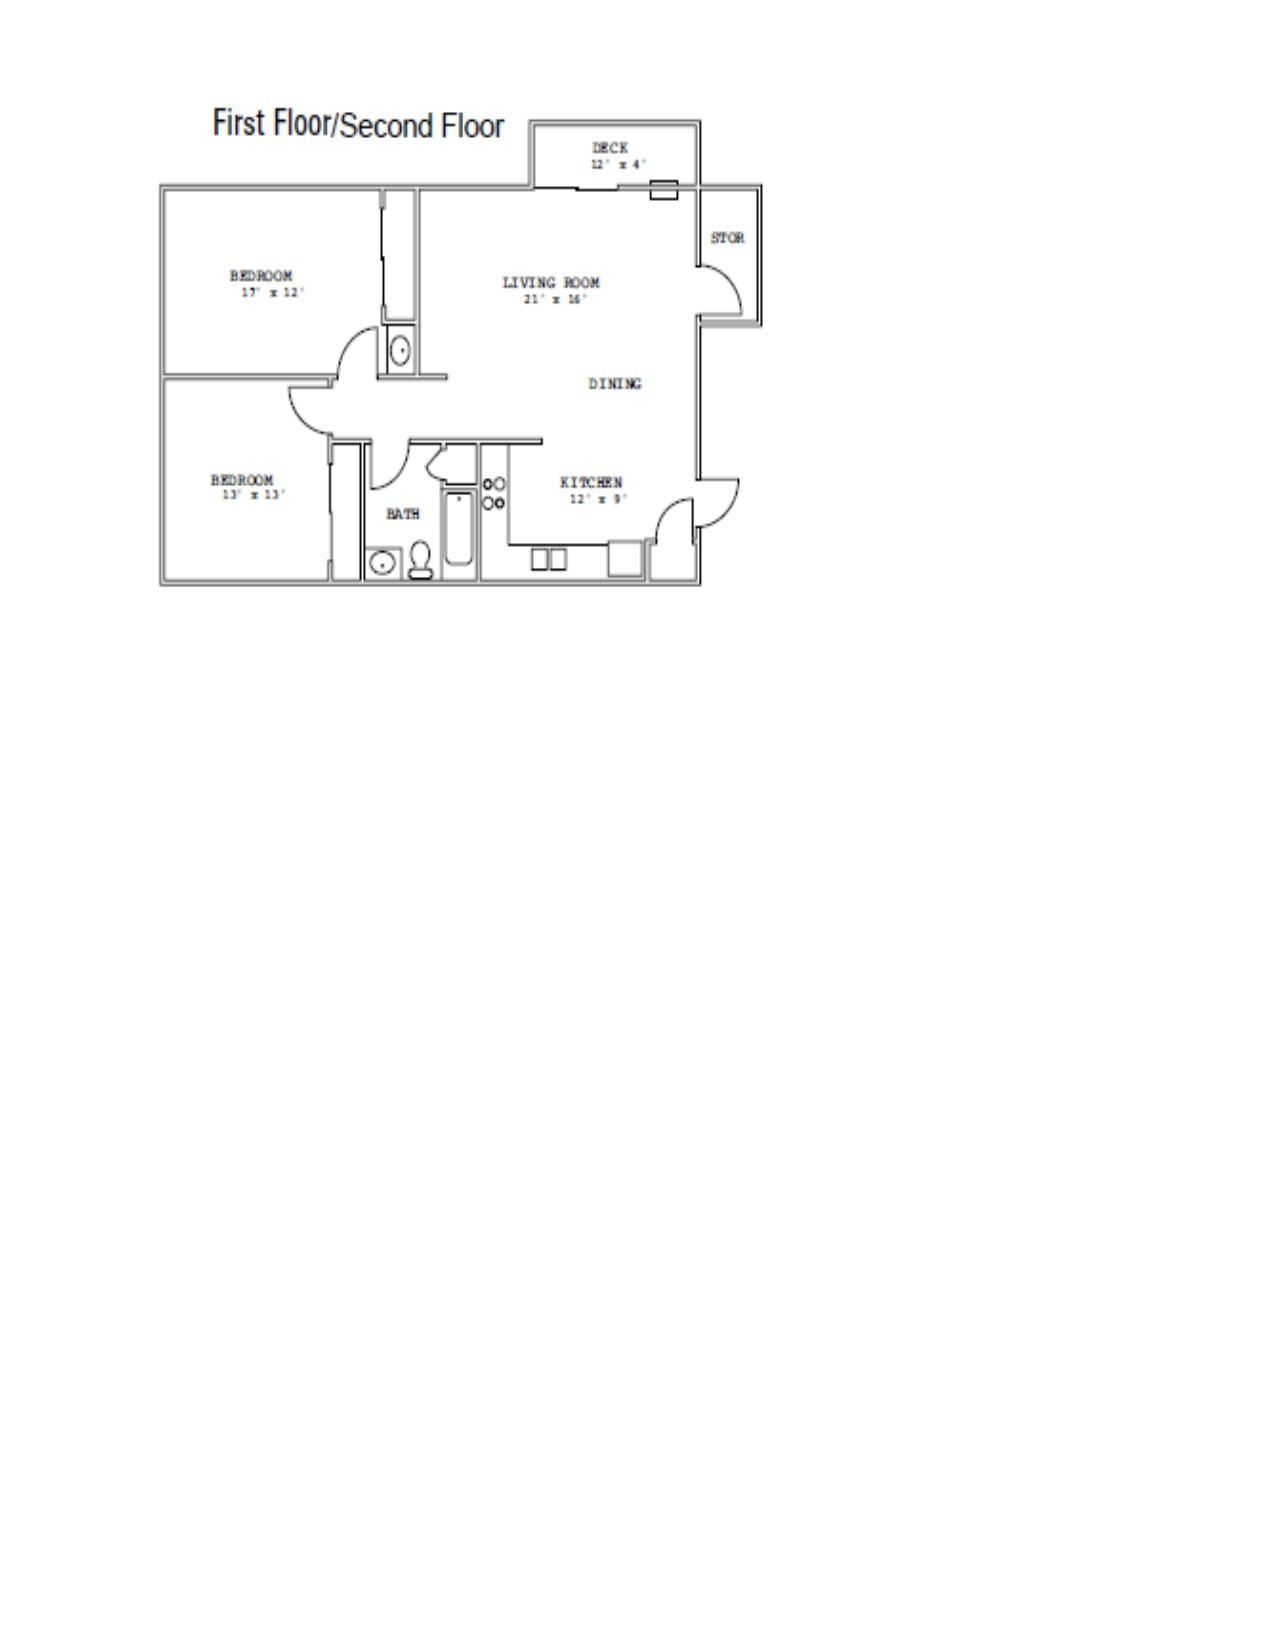 2204-07 Floorplan